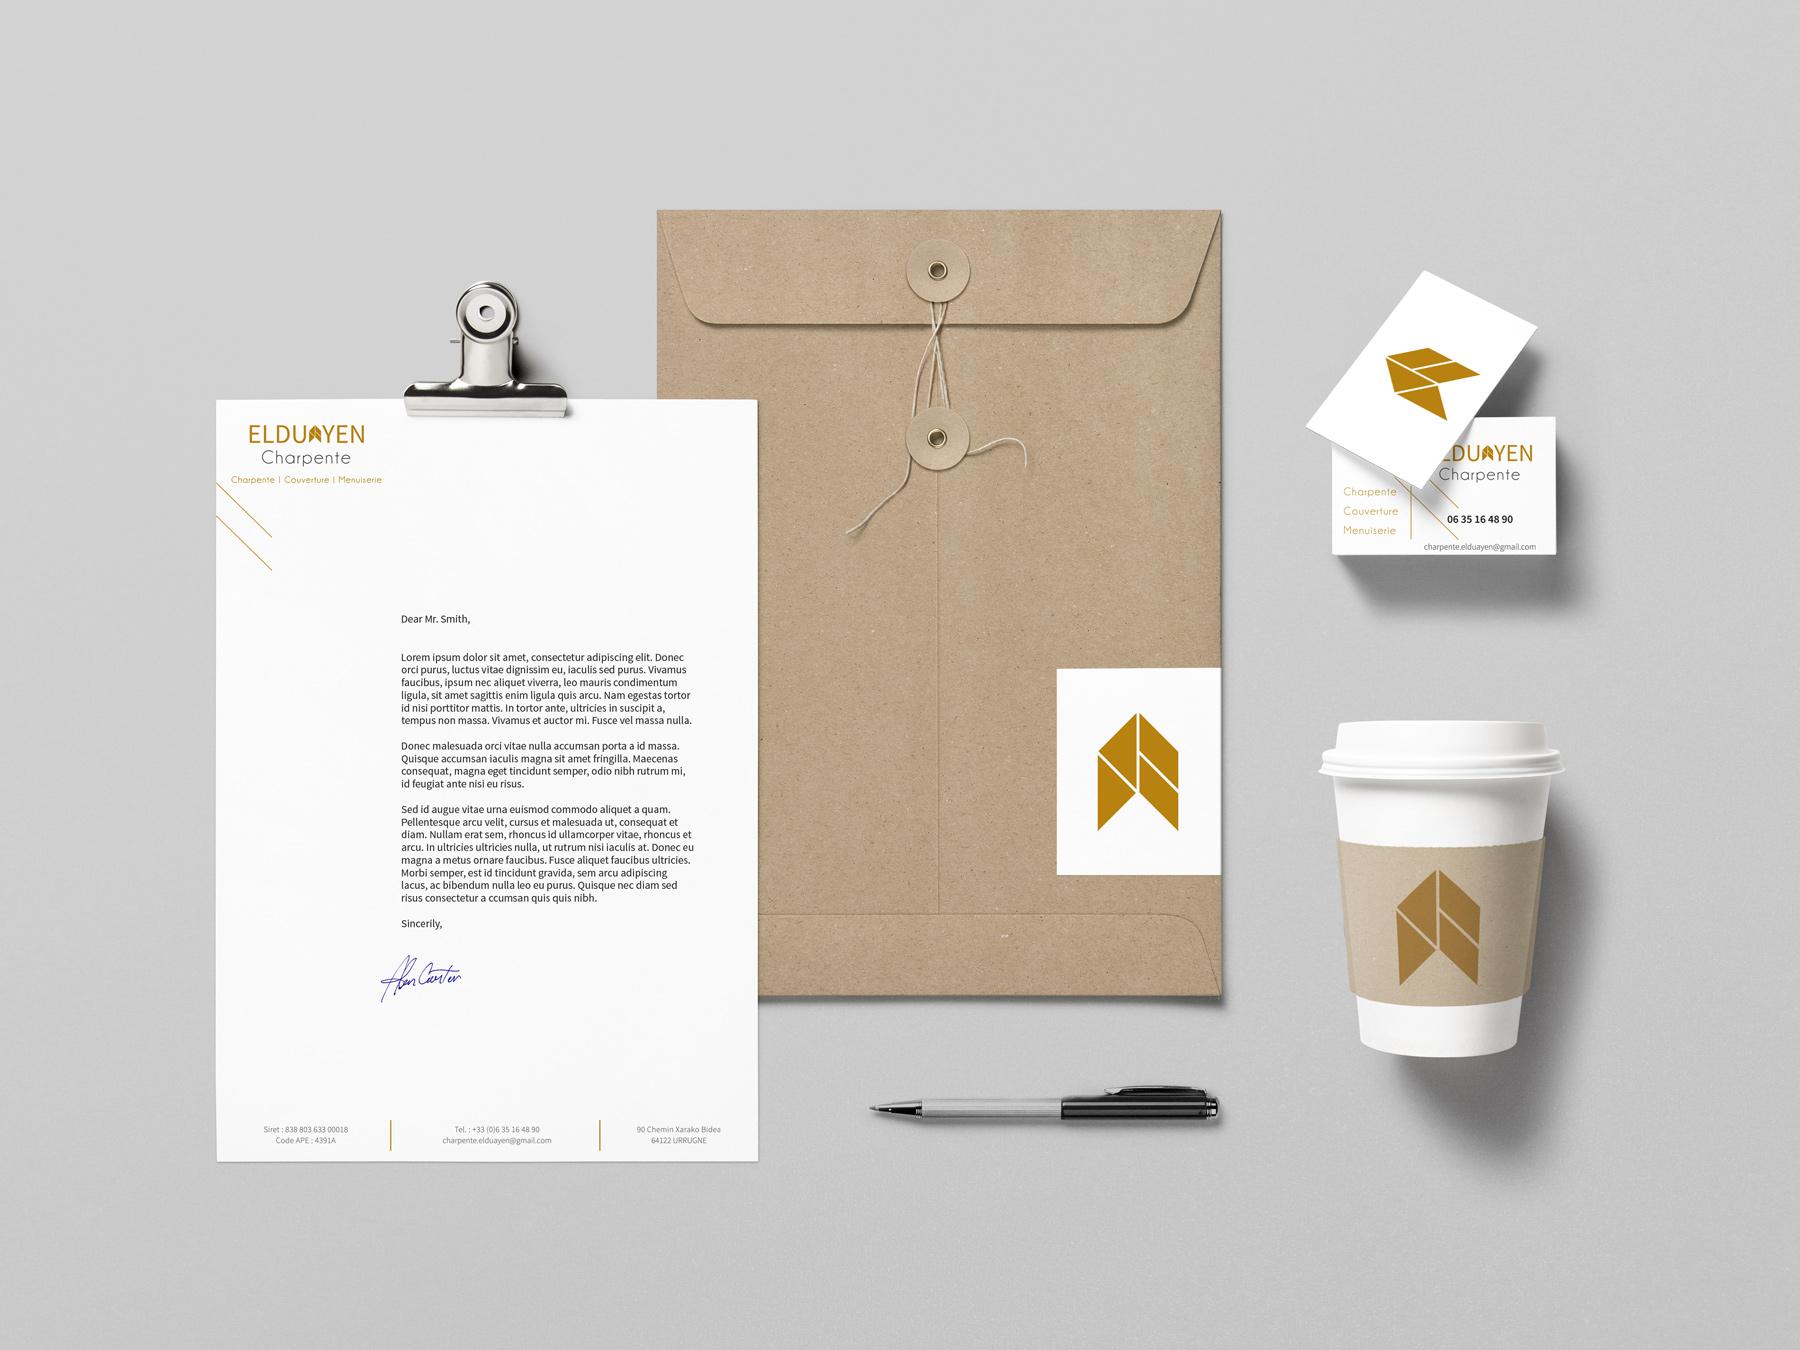 branding-elduayen